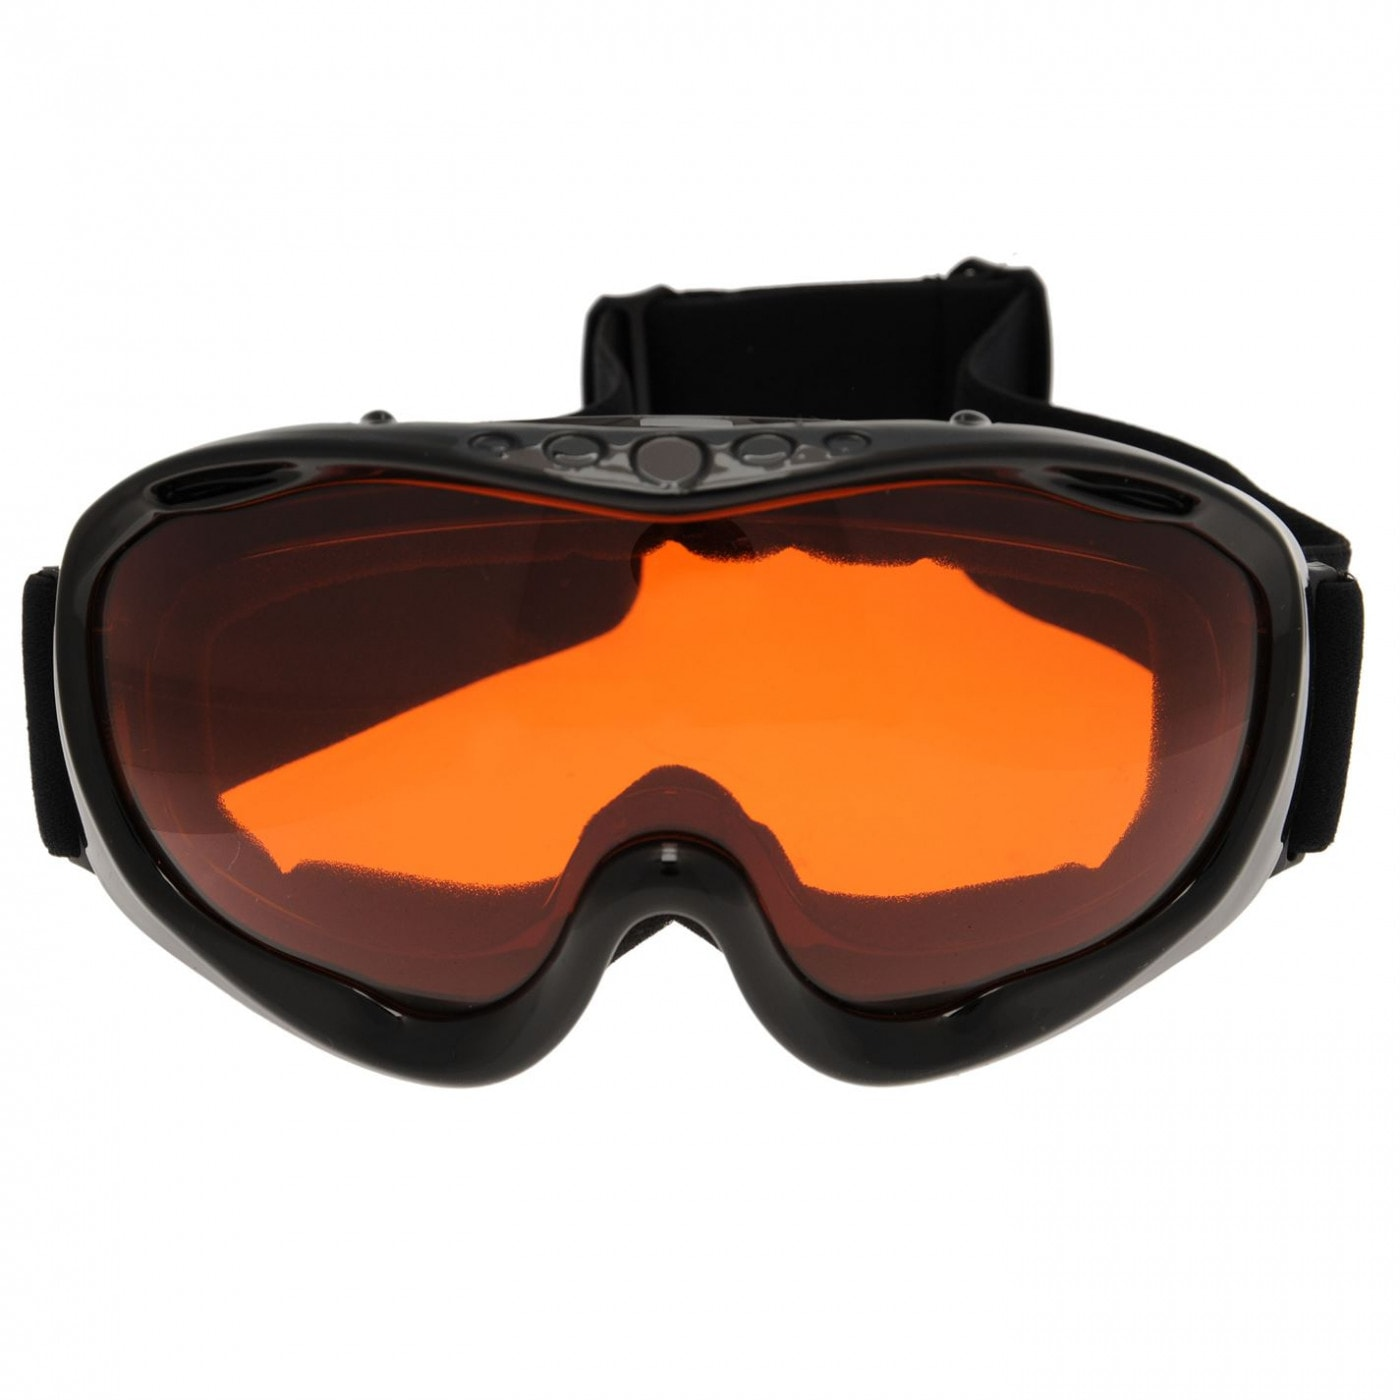 Campri Star Ski Goggles Mens